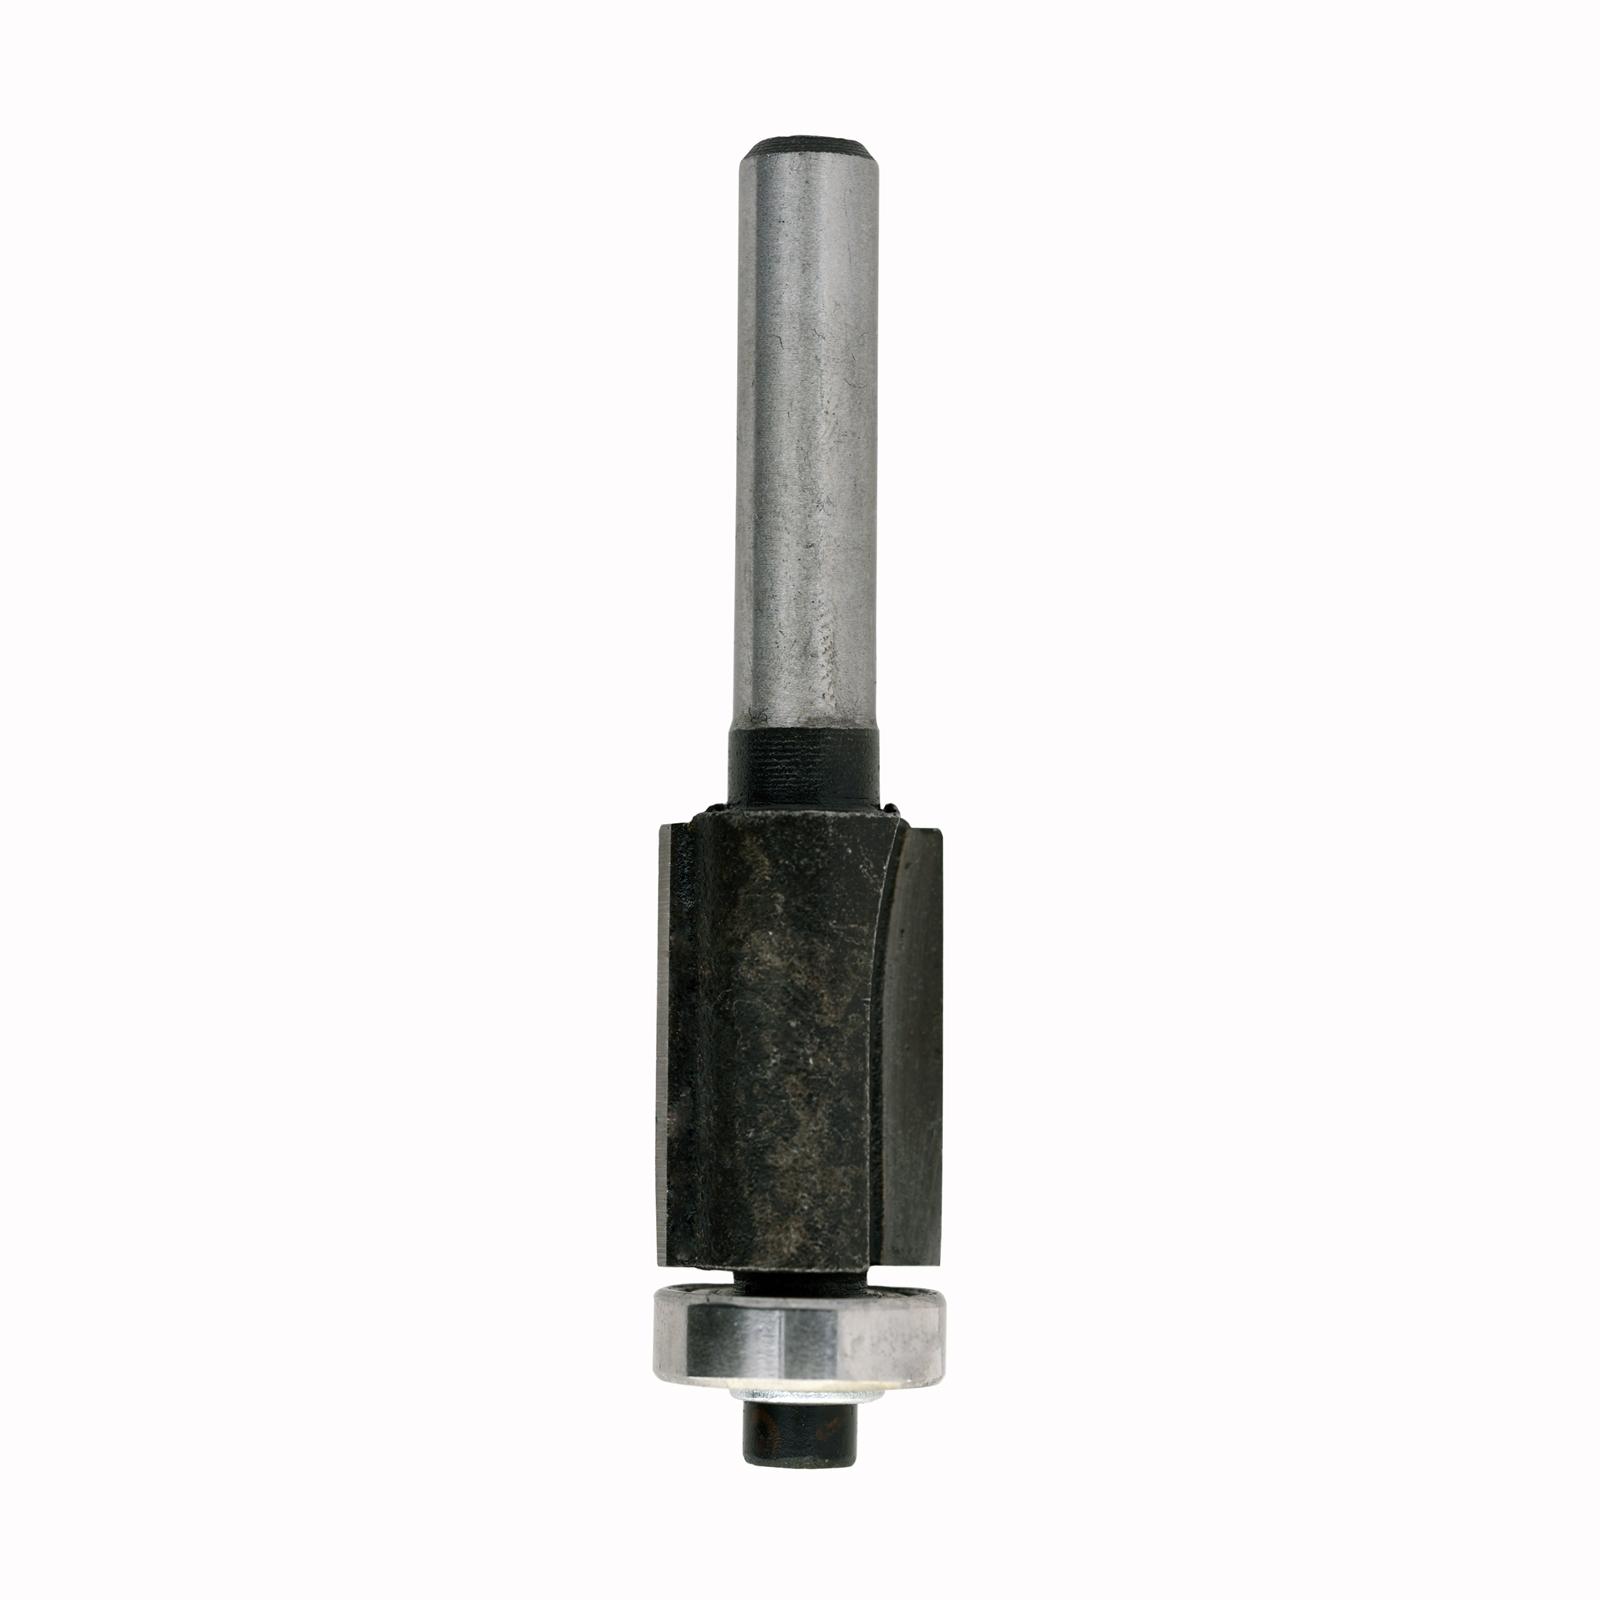 Ultra 6.4 x 13mm Flush Trim Router Bit